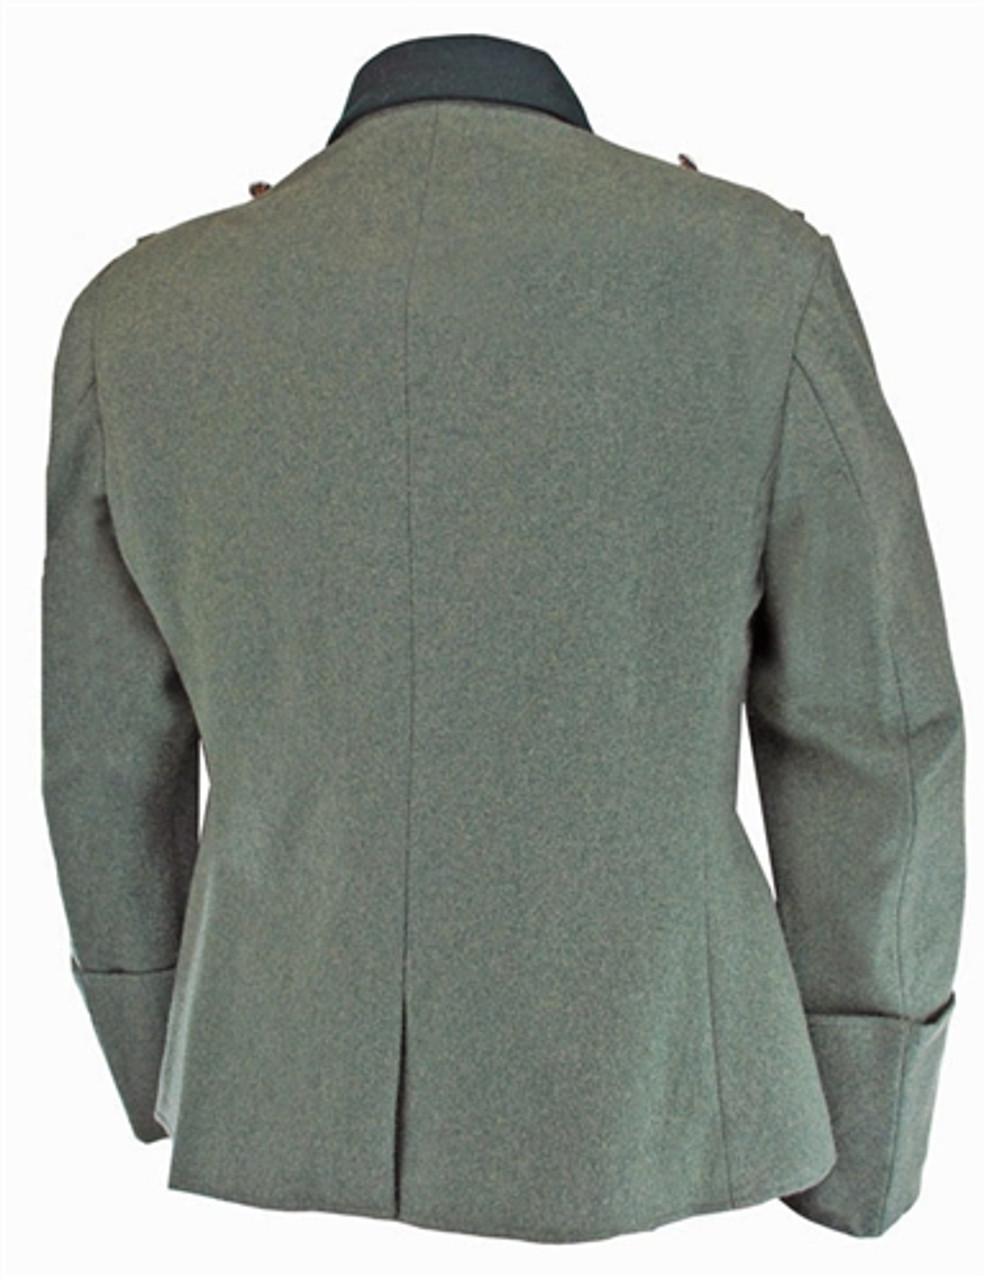 German Officer Combat Tunic in Field-grey wool from Hessen Antique